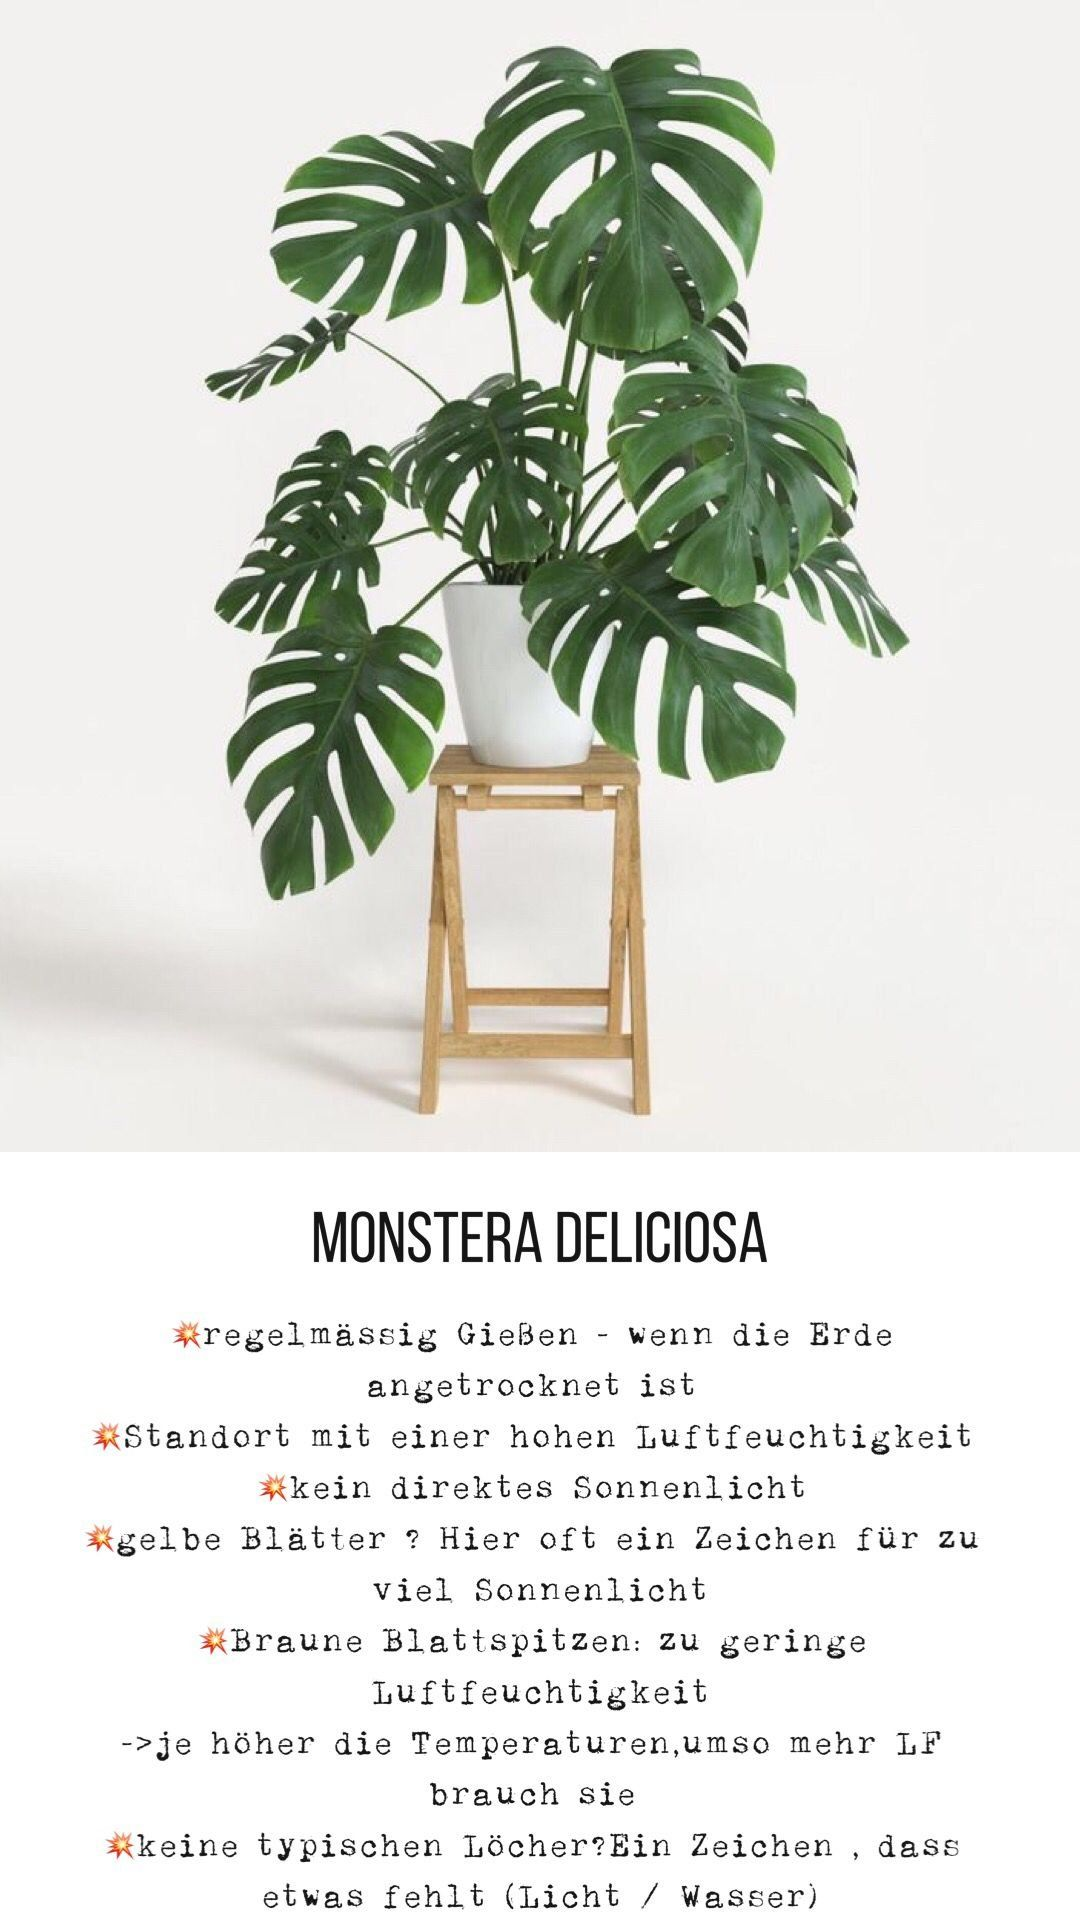 Monstera Deliciosa Modern Design Monstera Deliciosa Garden Boxes Diy Plants